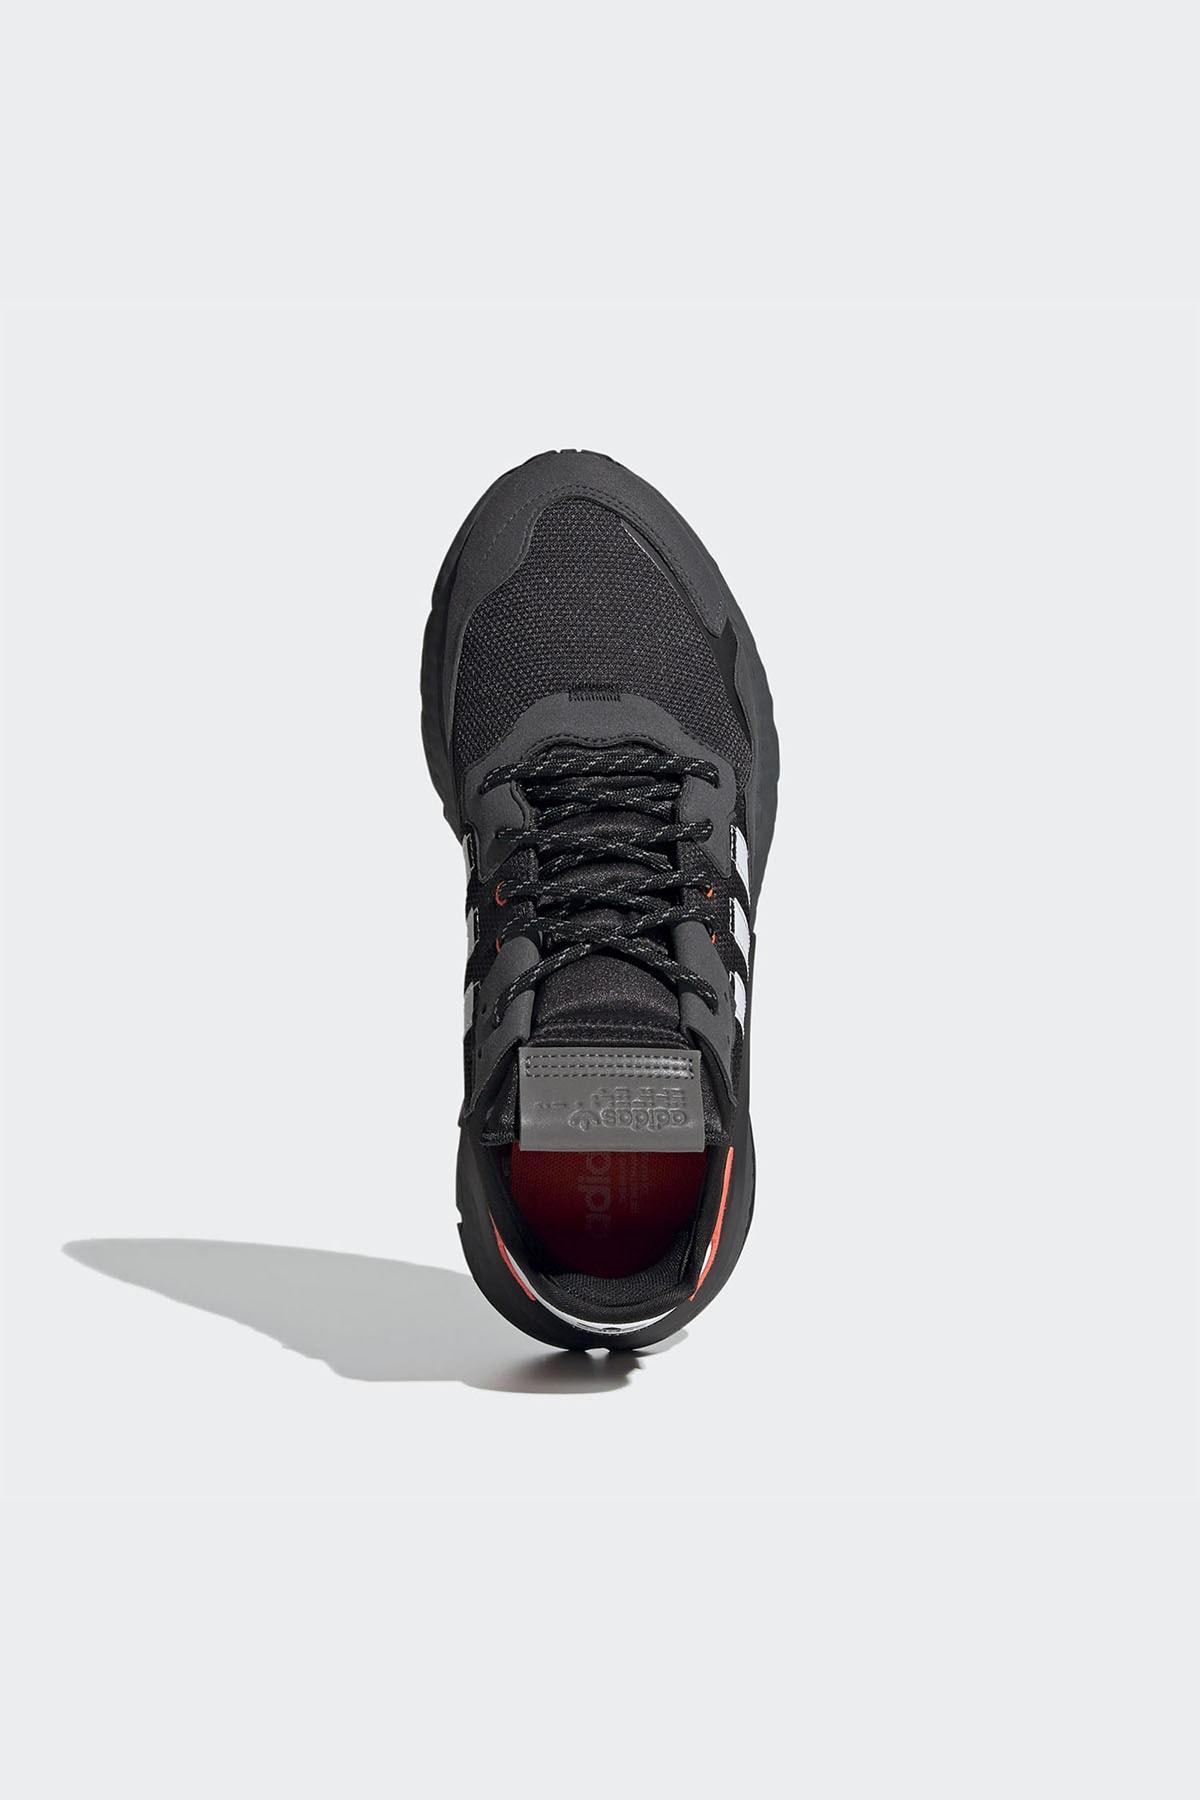 adidas Erkek Siyah Bağcıklı Sneaker 2